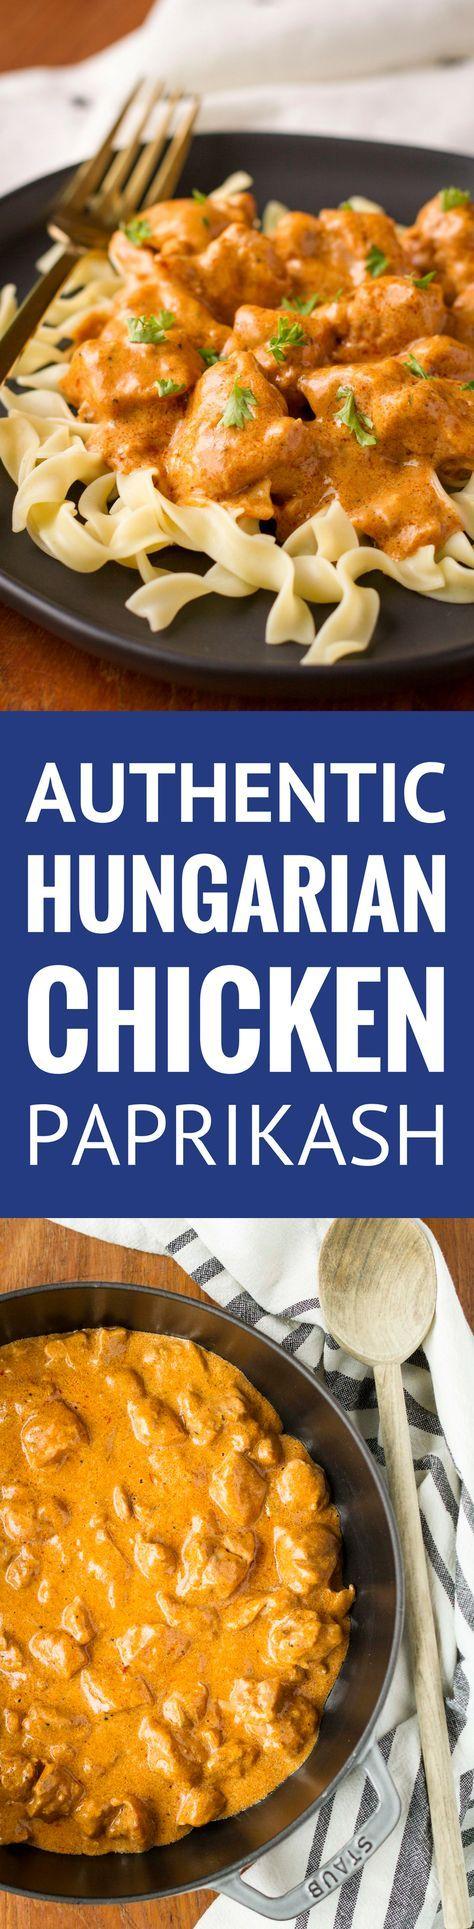 Chicken Paprikash - authentic Hungarian chicken paprikash using traditional Hungarian sweet paprika… Also known as Chicken Paprika.